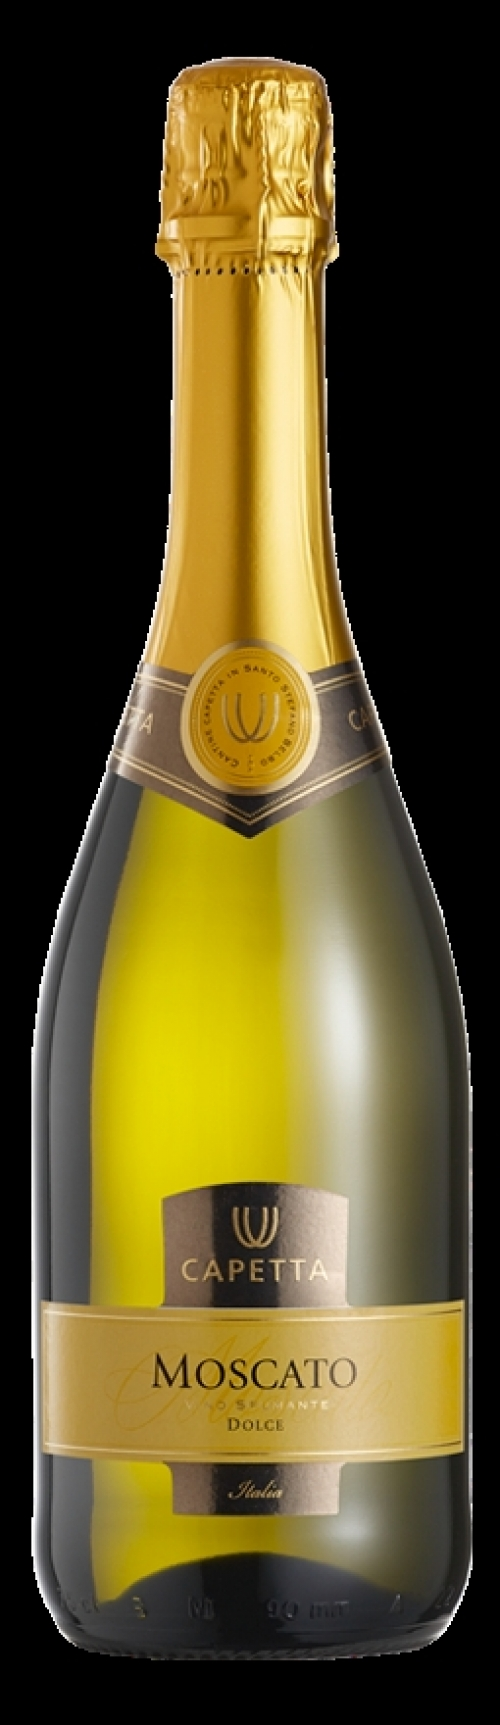 Rượu vang Moscato Spumante